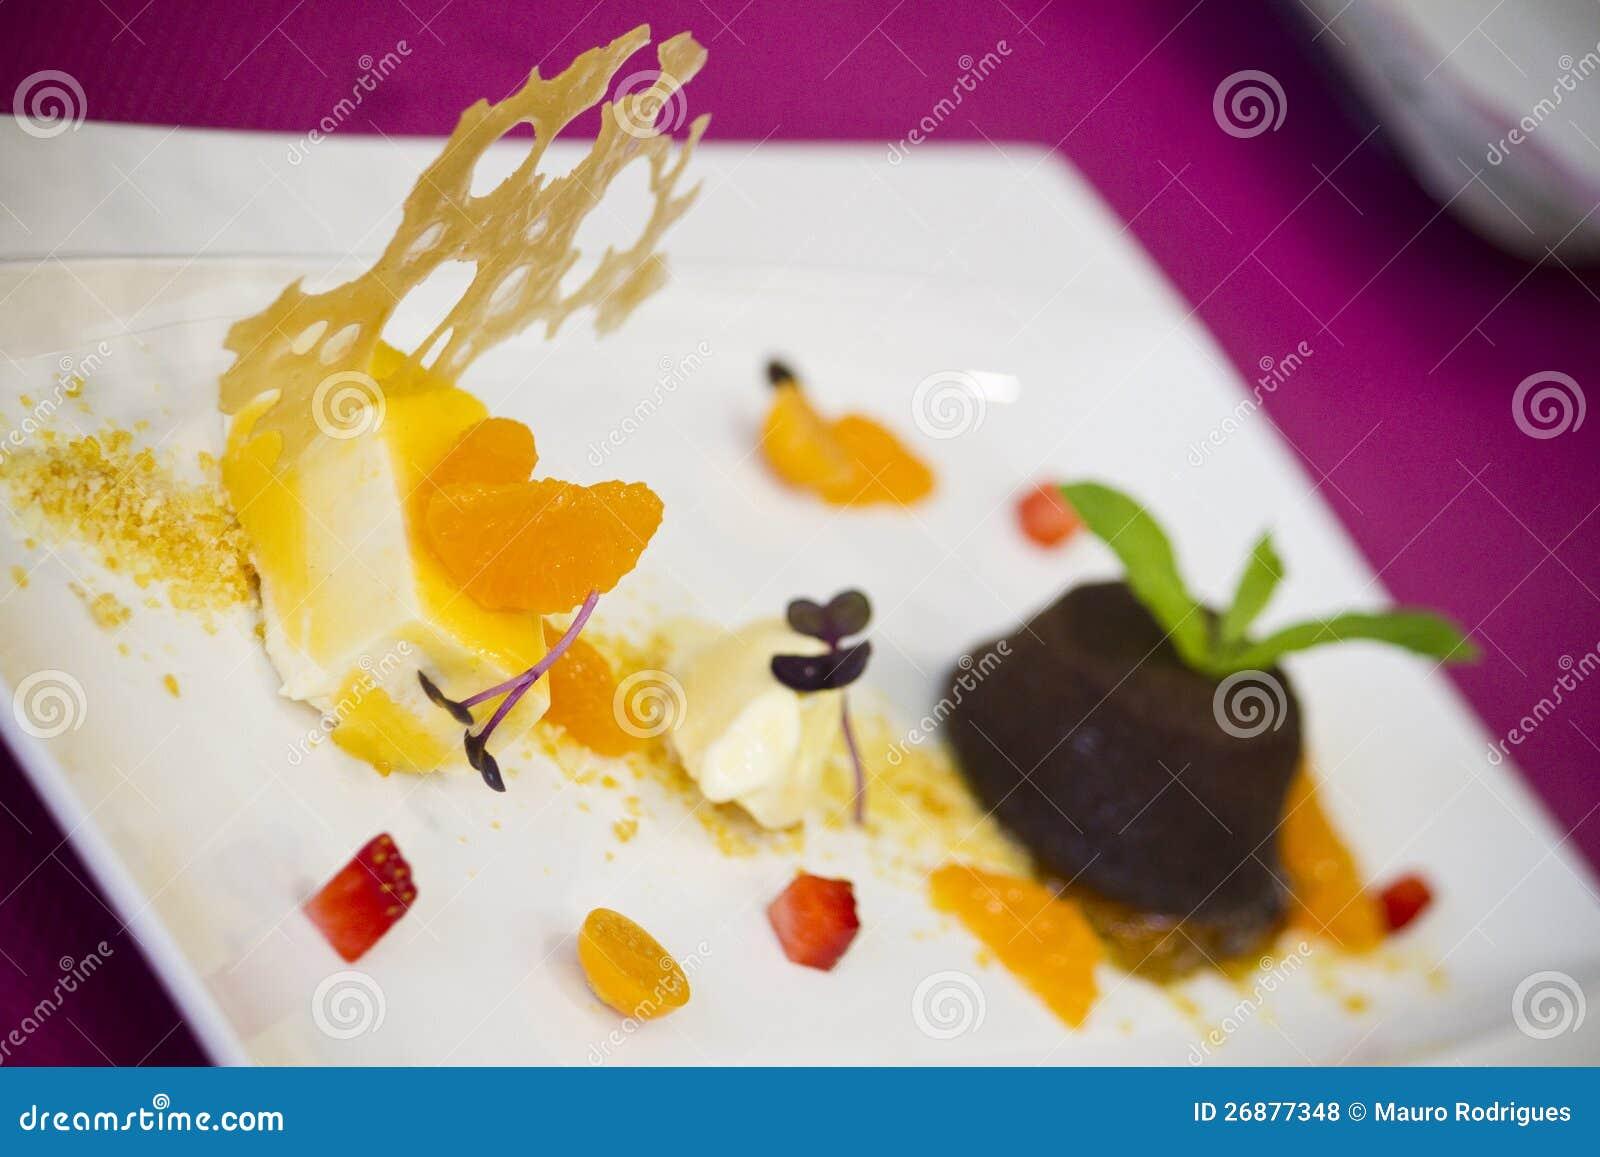 Gourmet dish food